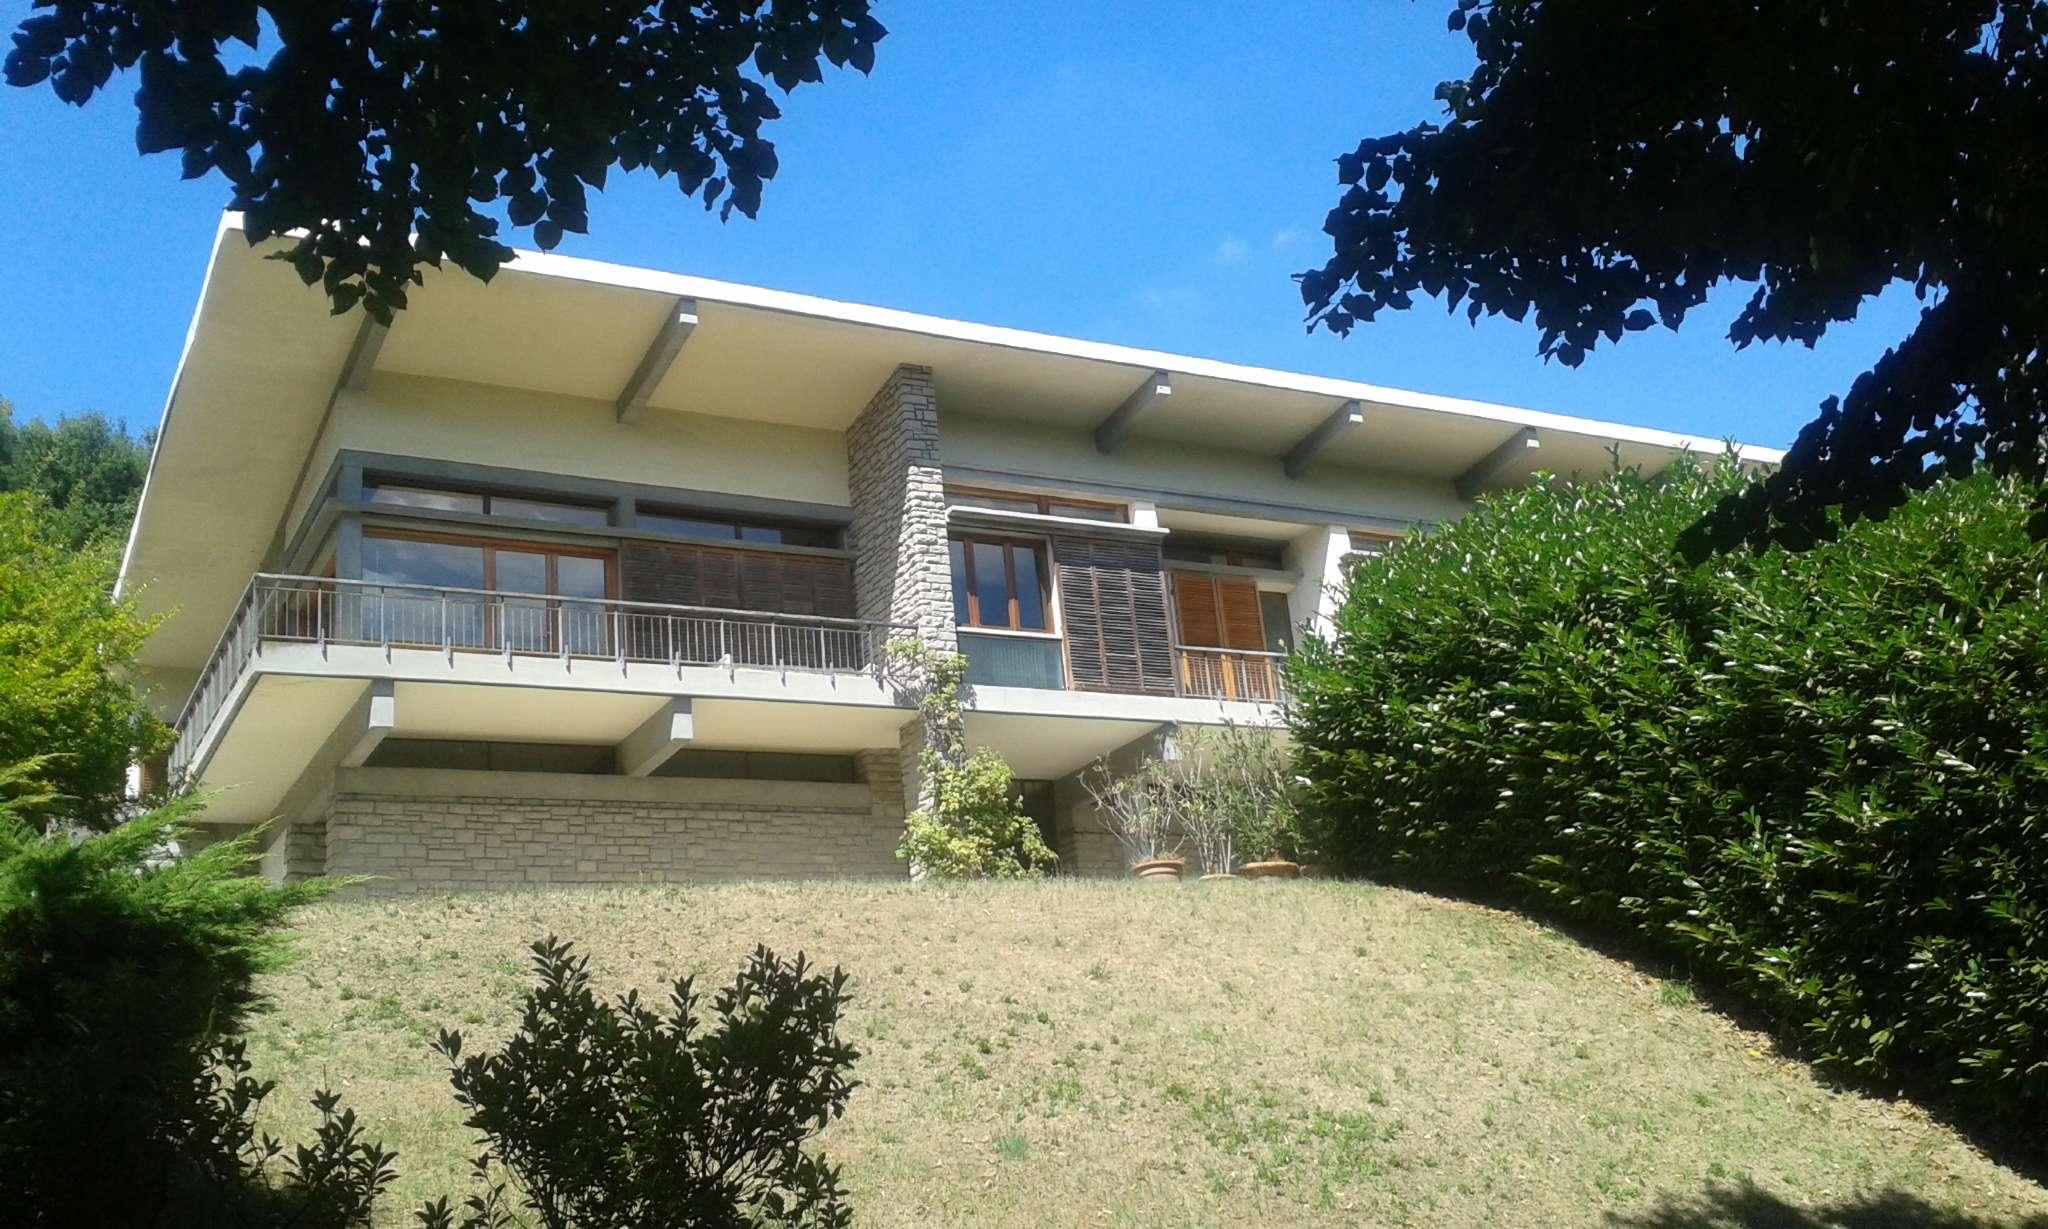 VILLA per vacanze estive in Romagna Rif.10248124